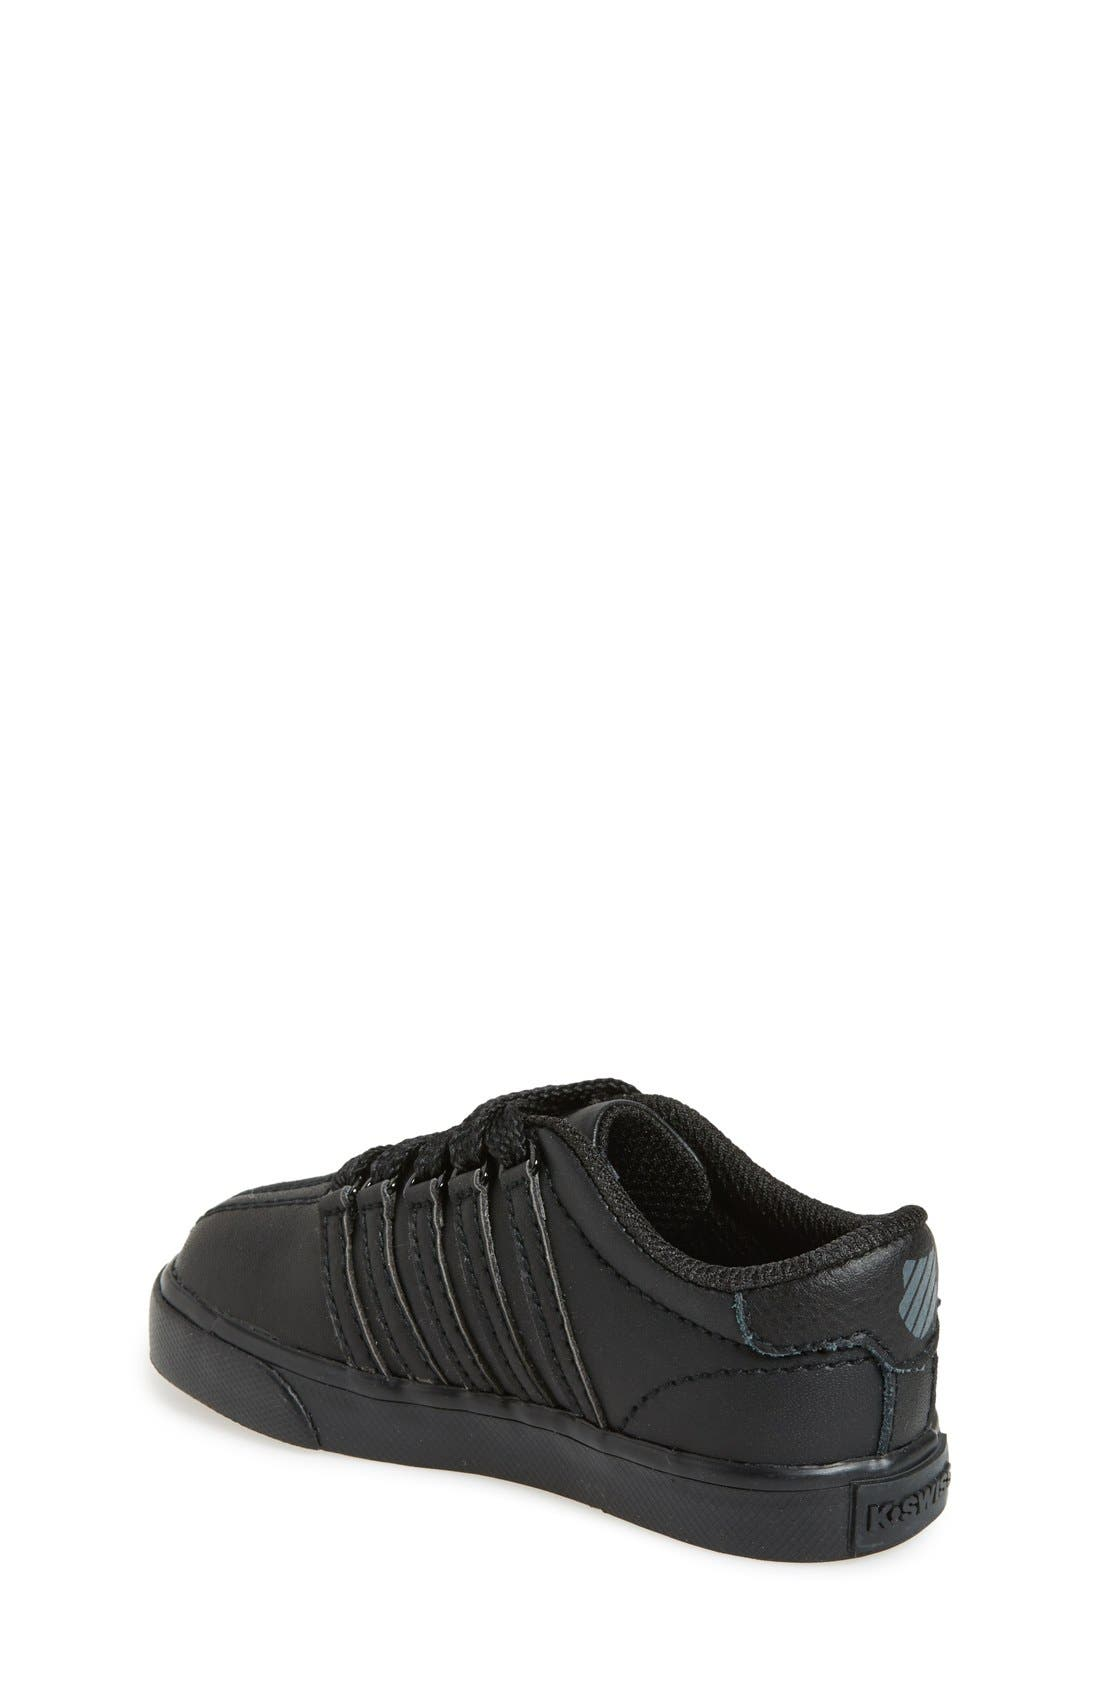 'Classic' Sneaker,                             Alternate thumbnail 3, color,                             001